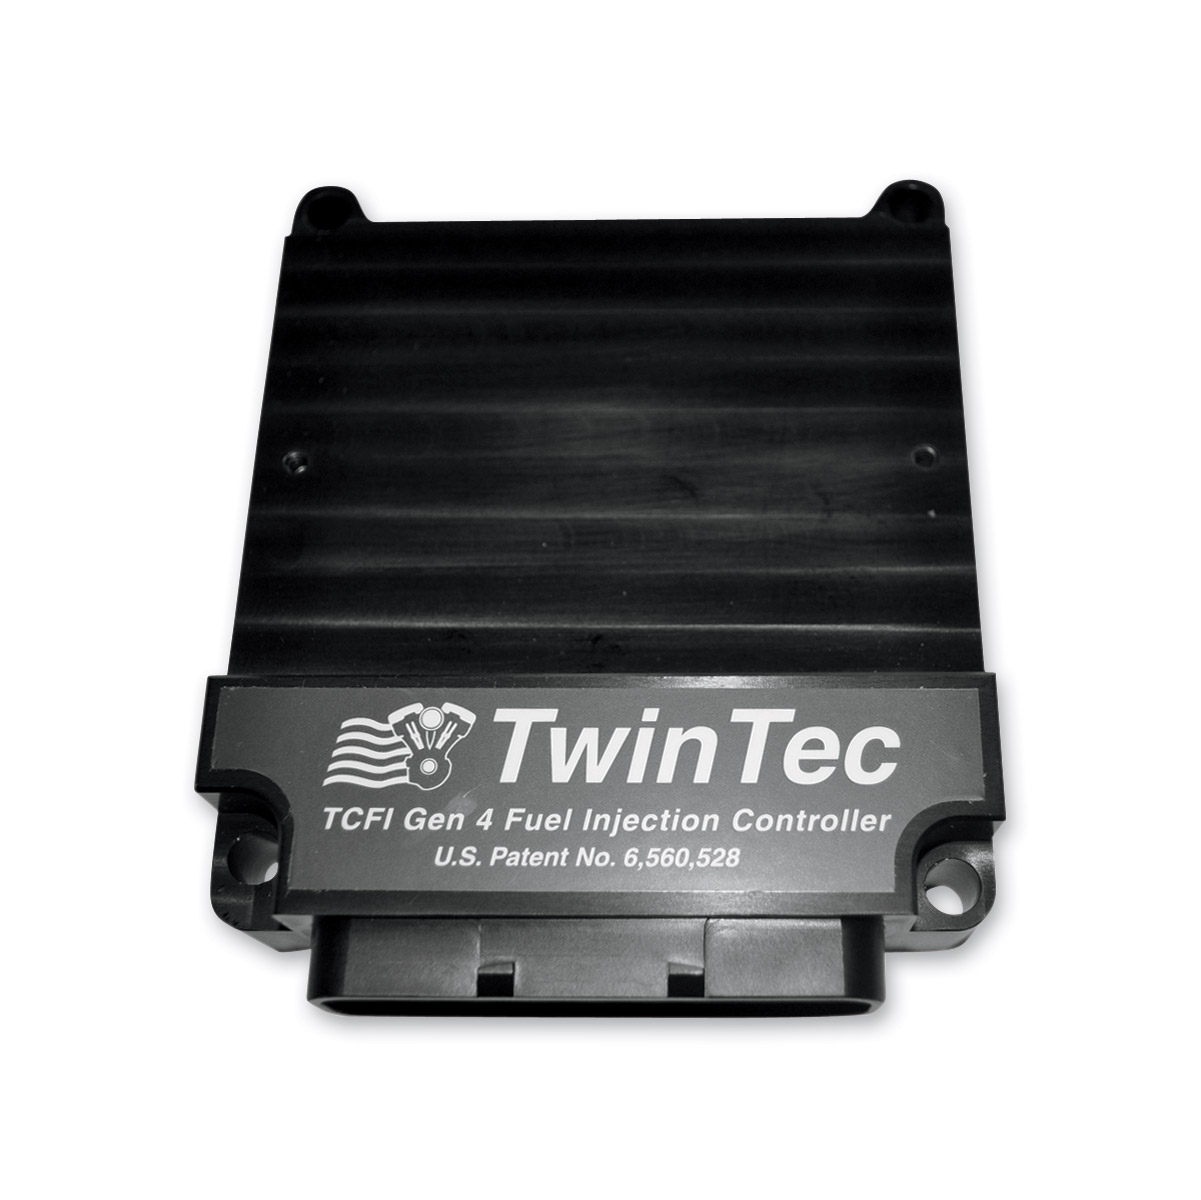 Daytona Twin Tec FI-to-Carburetor Conversion Kit